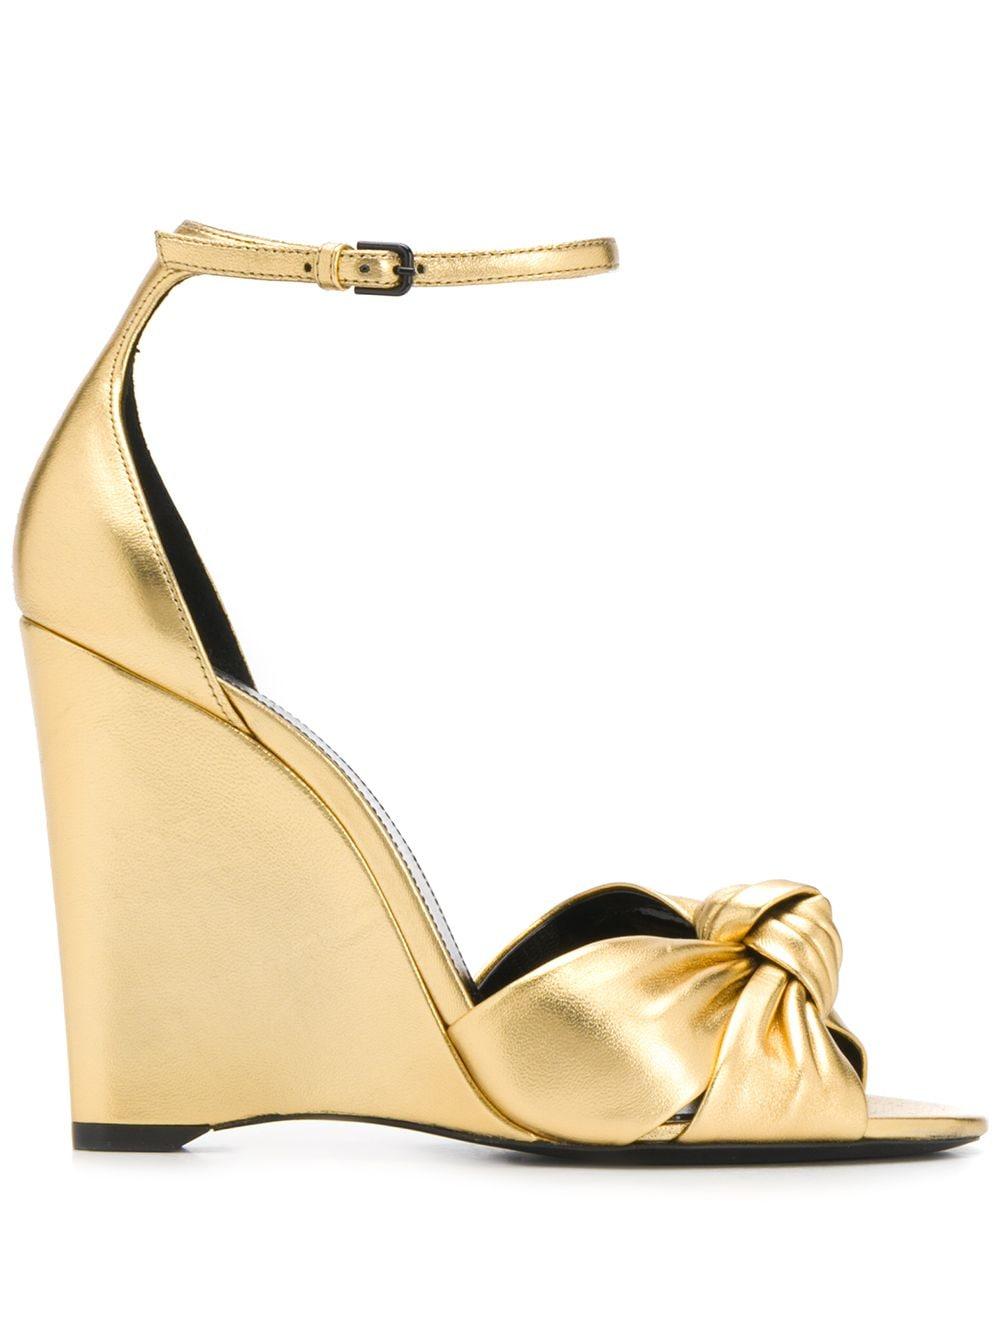 Saint Laurent Wedge-Sandalen mit Knoten, 95mm - Gold